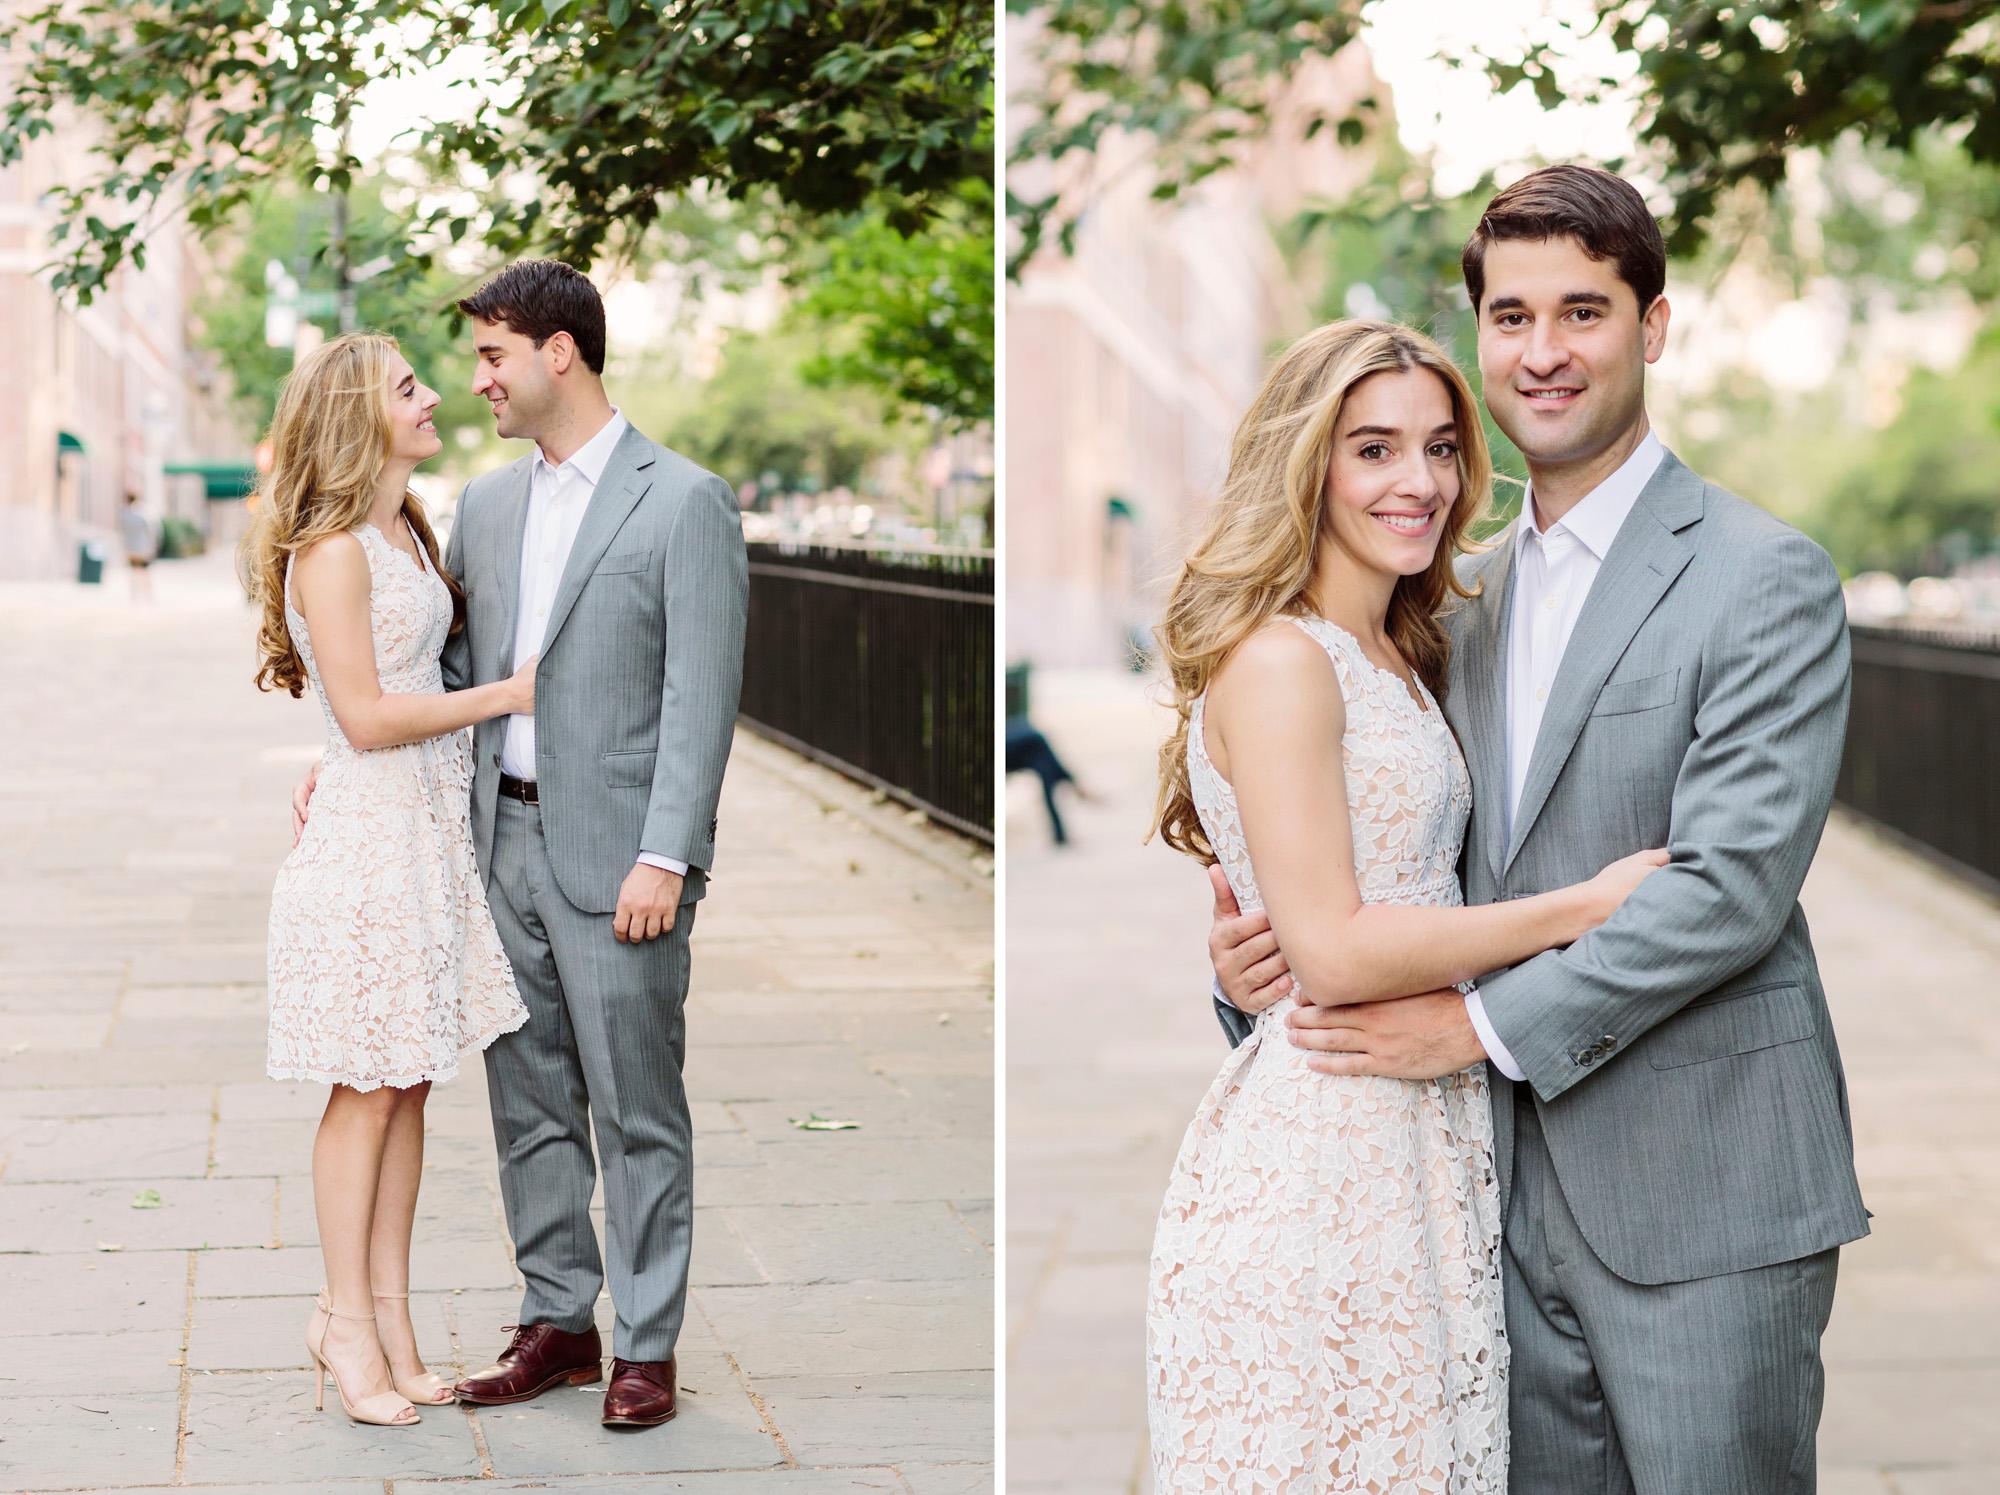 01_Christina_Daniel_Carl_Schurz_Park_Engagement_NYC_Tanya_Salazar_Phototgraphy.jpg